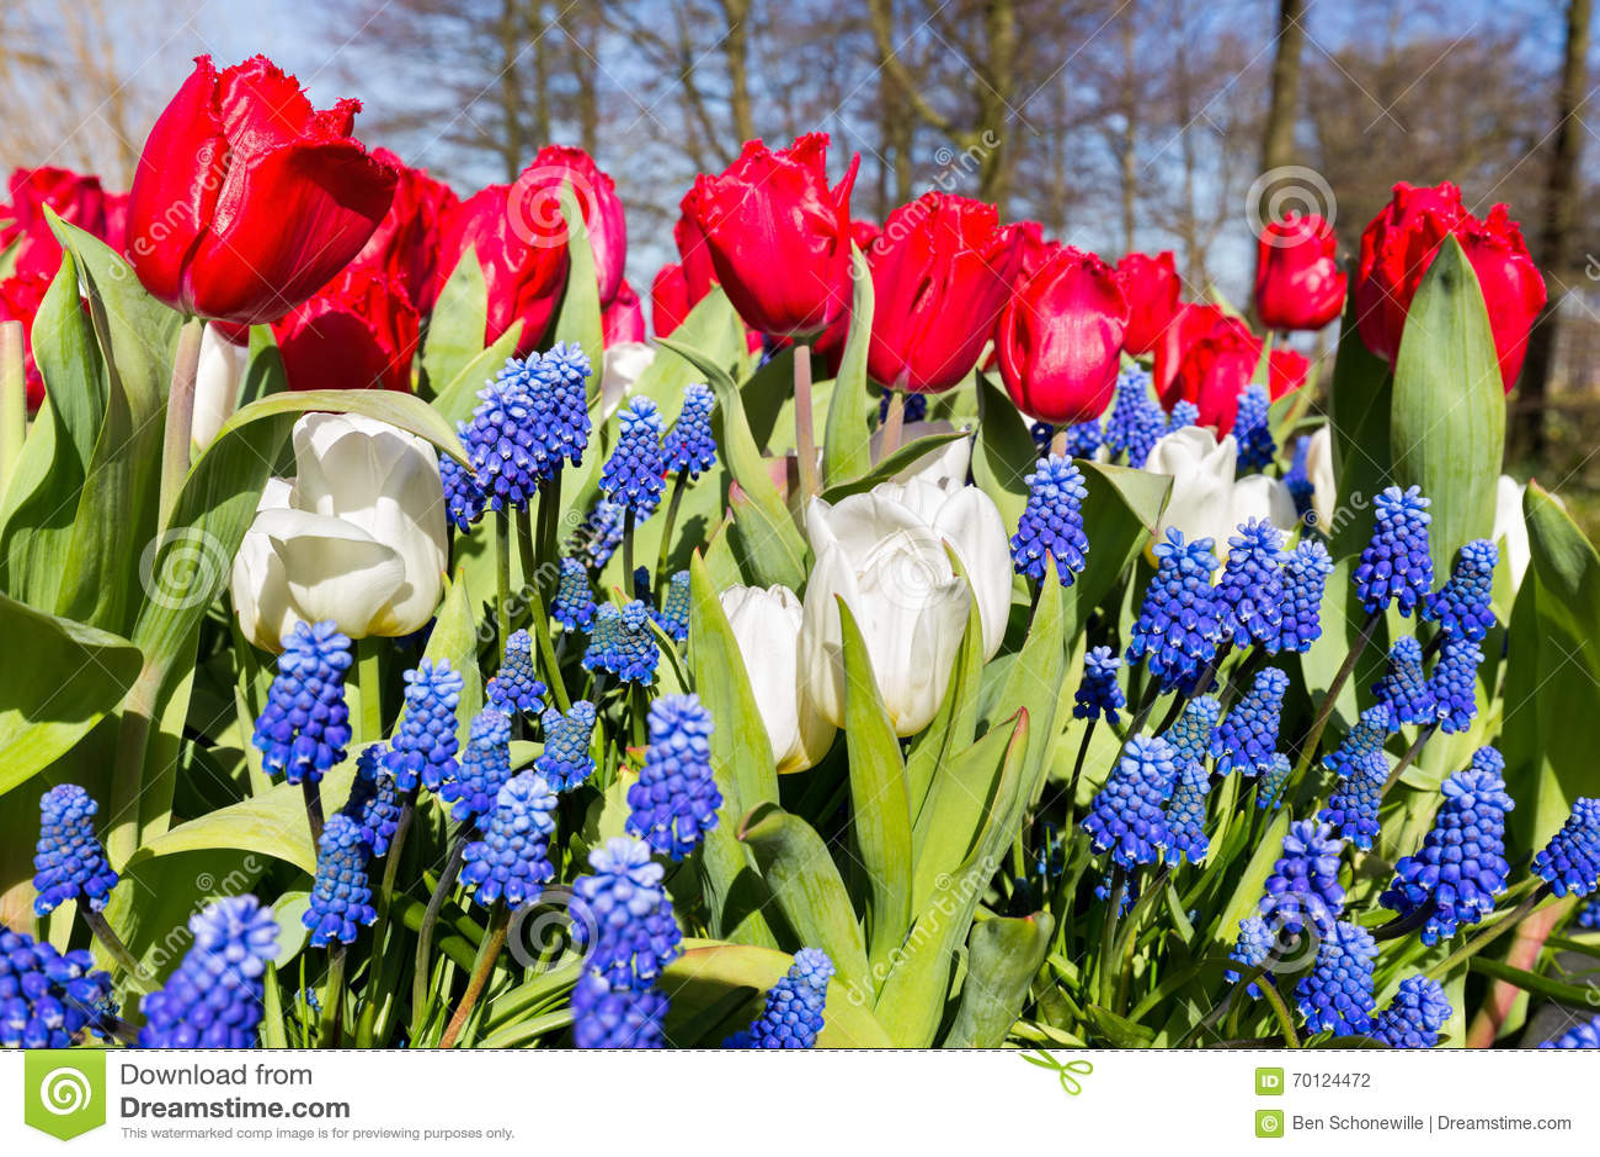 Red white blue flowers in spring season stock photo image of red white blue flowers in spring season izmirmasajfo Gallery